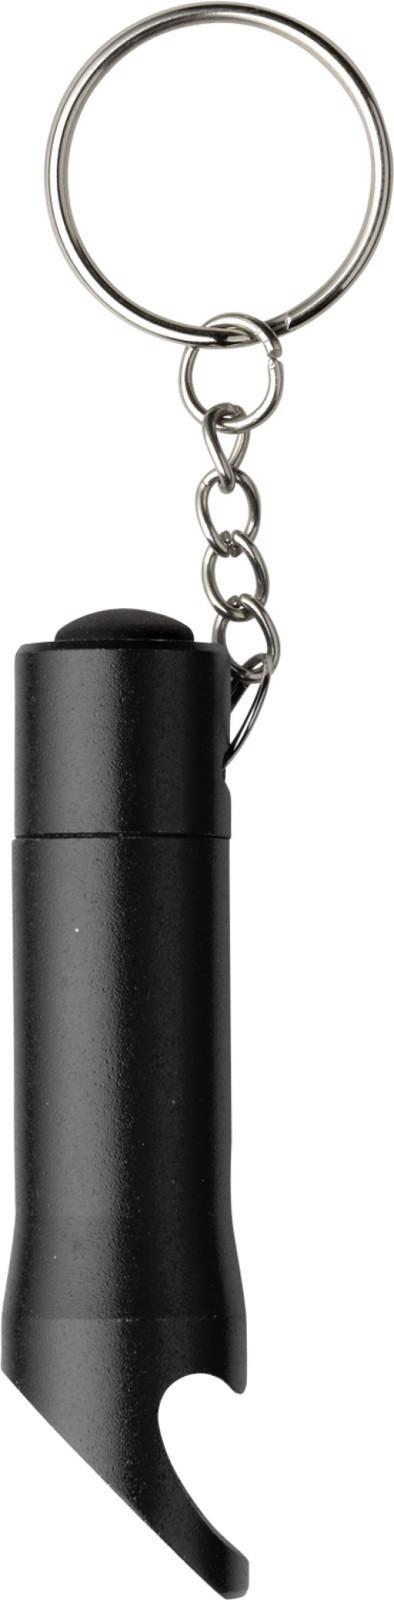 Aluminium 2-in-1 key holder - Black